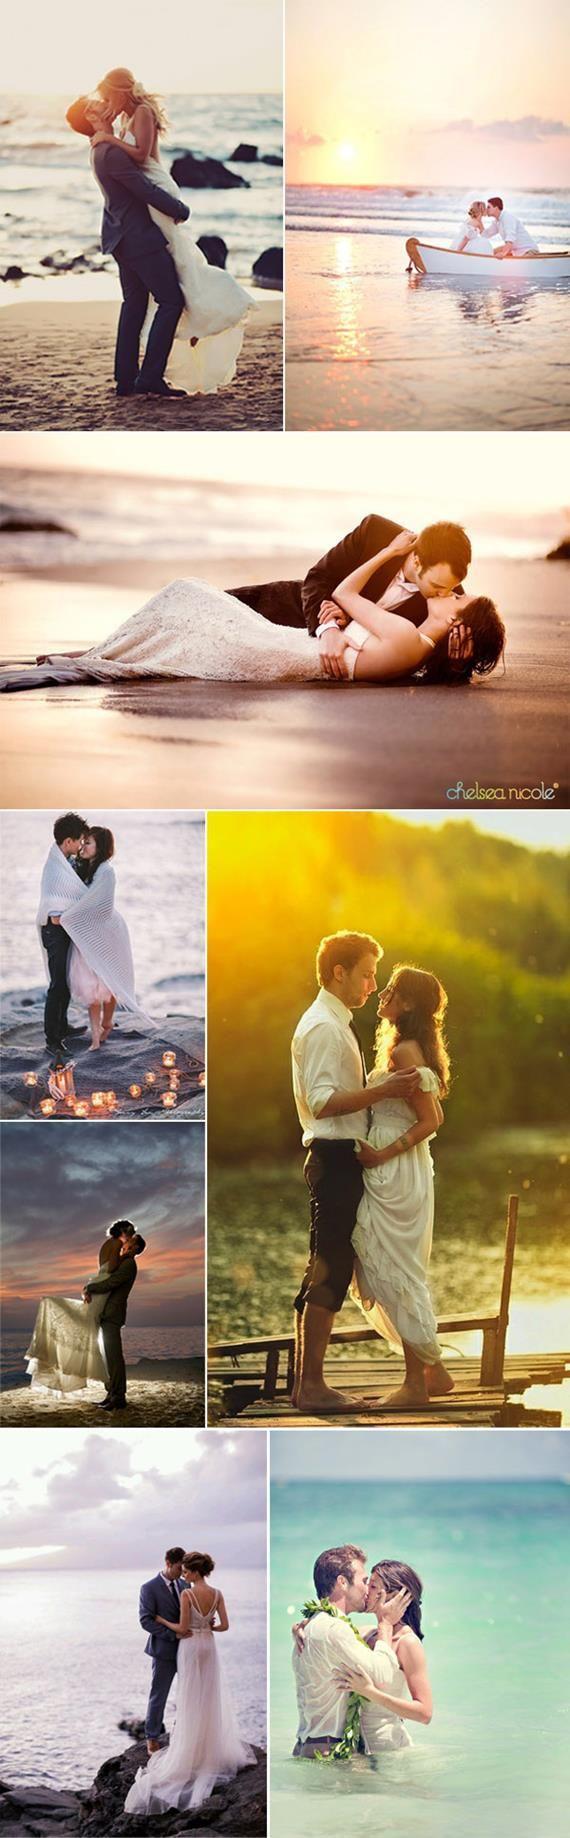 Romantic beach wedding photo ideas